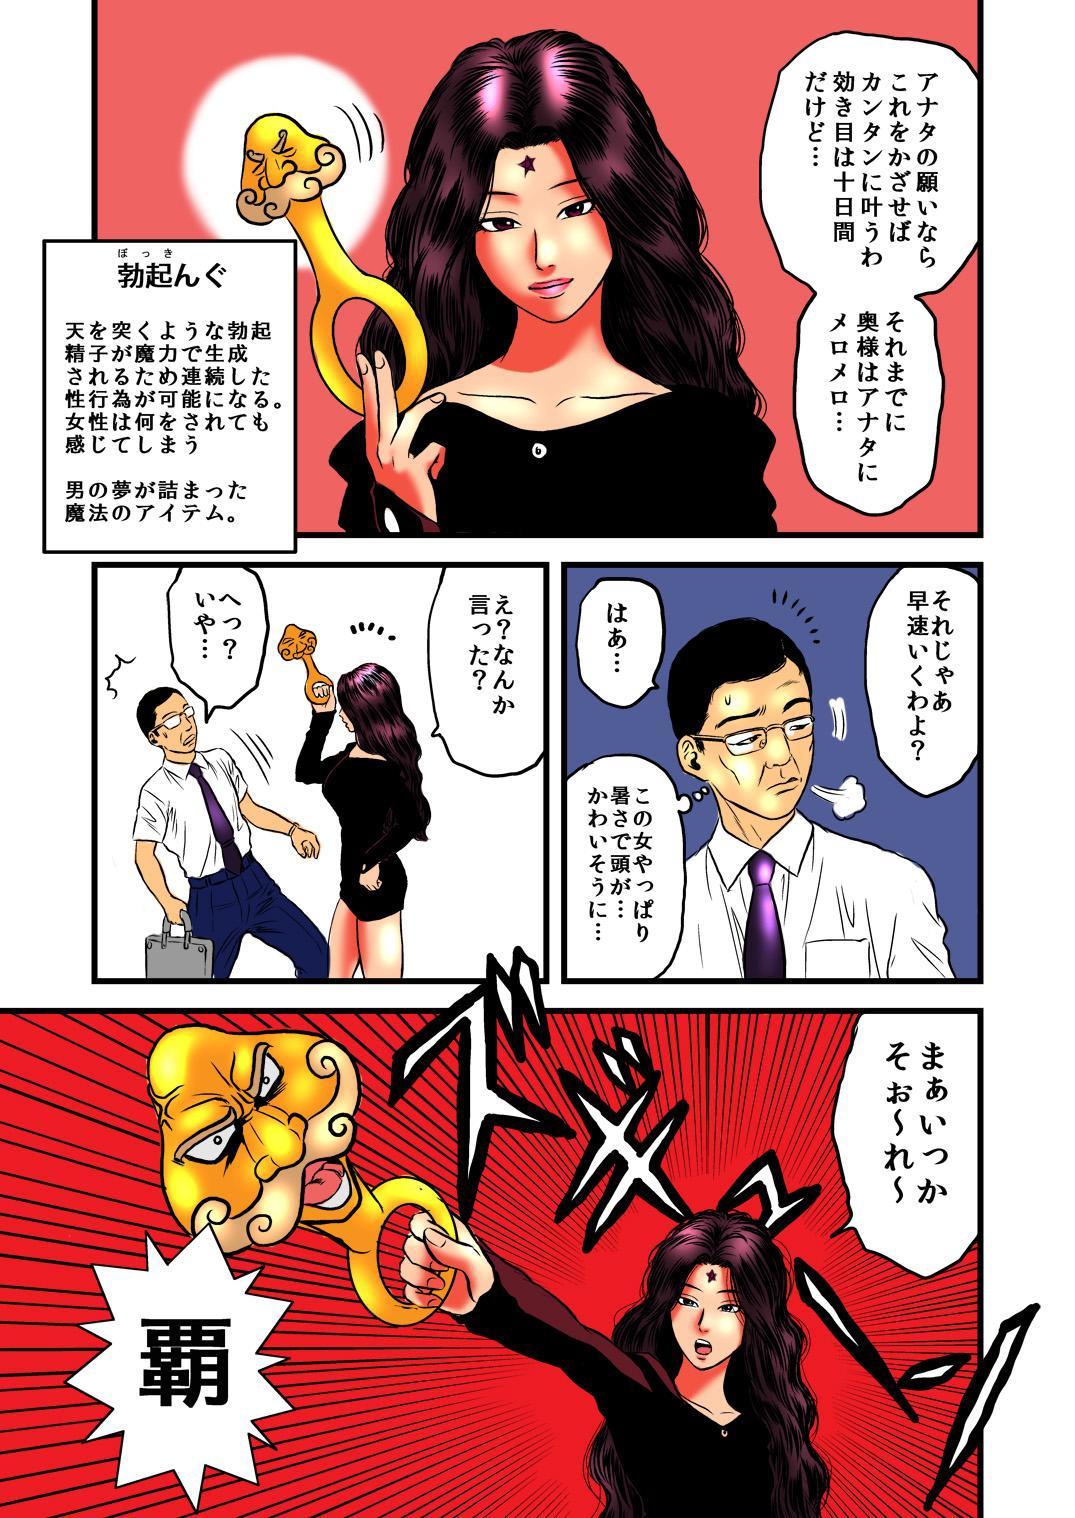 Ryoujoku no Katei Houmon ・ Zenpen 1